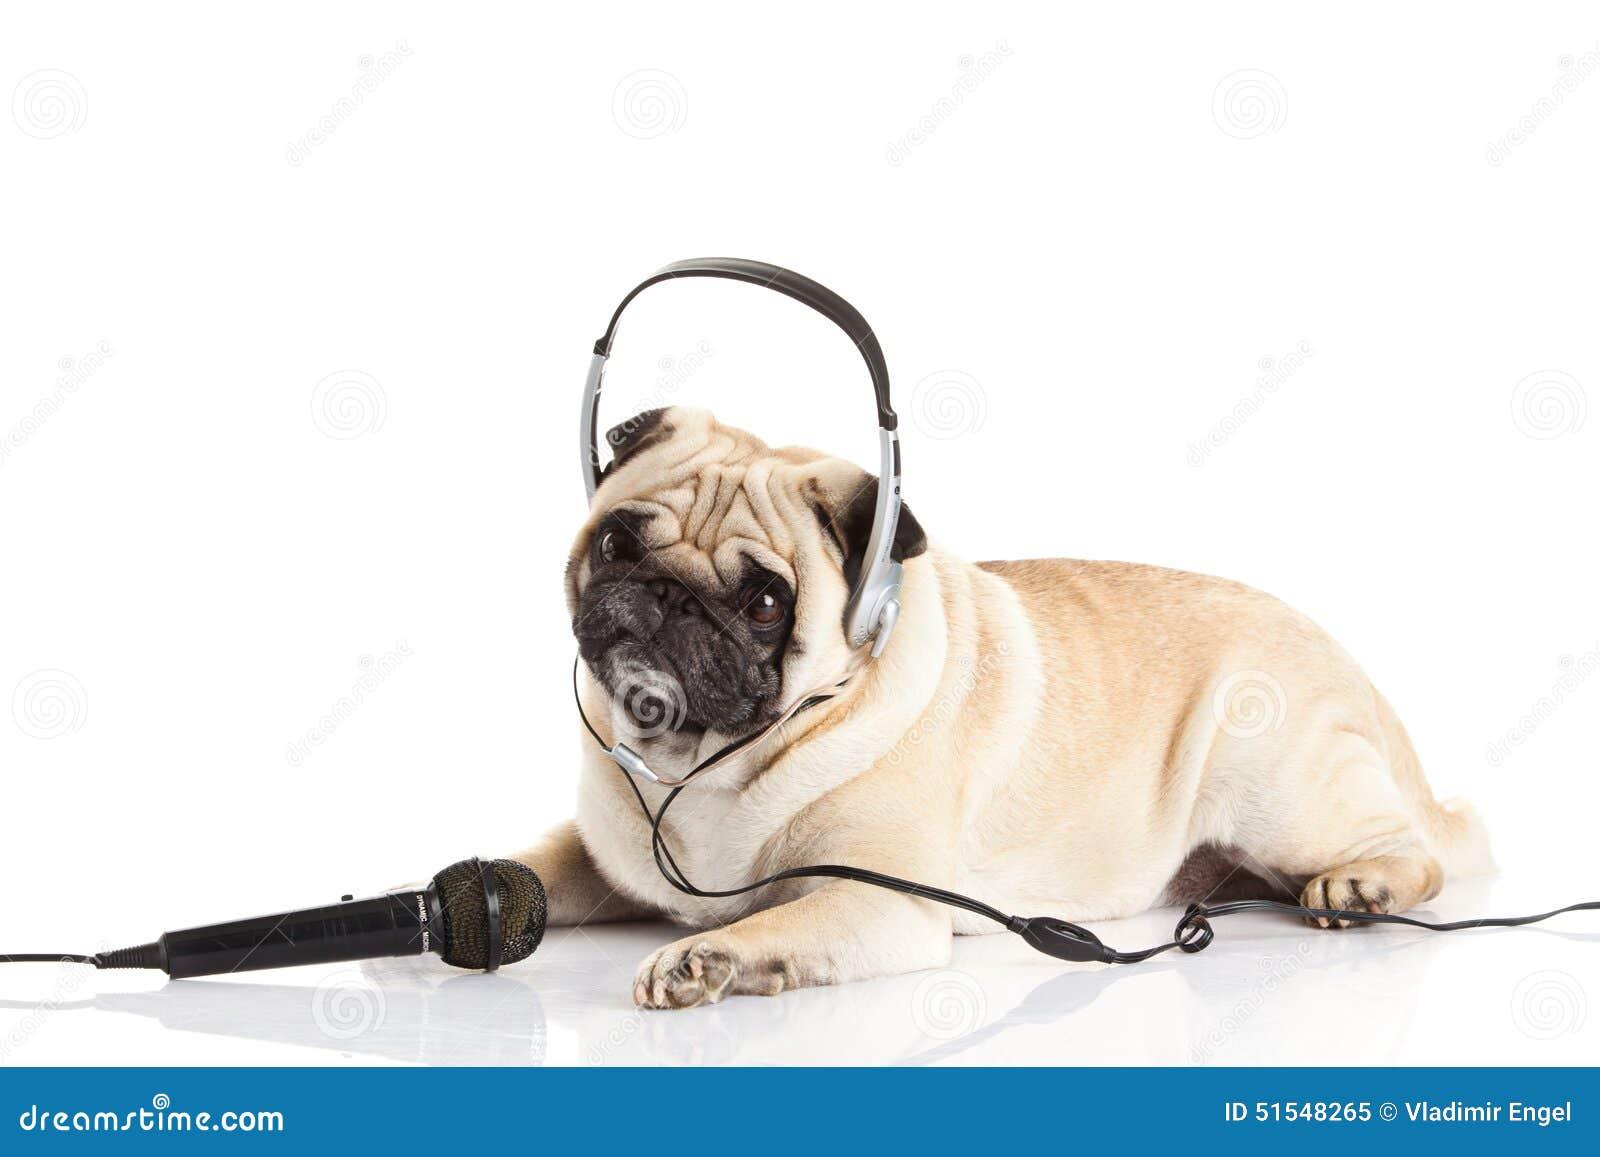 Pug dog with headphone isolated on white background callcenter concept